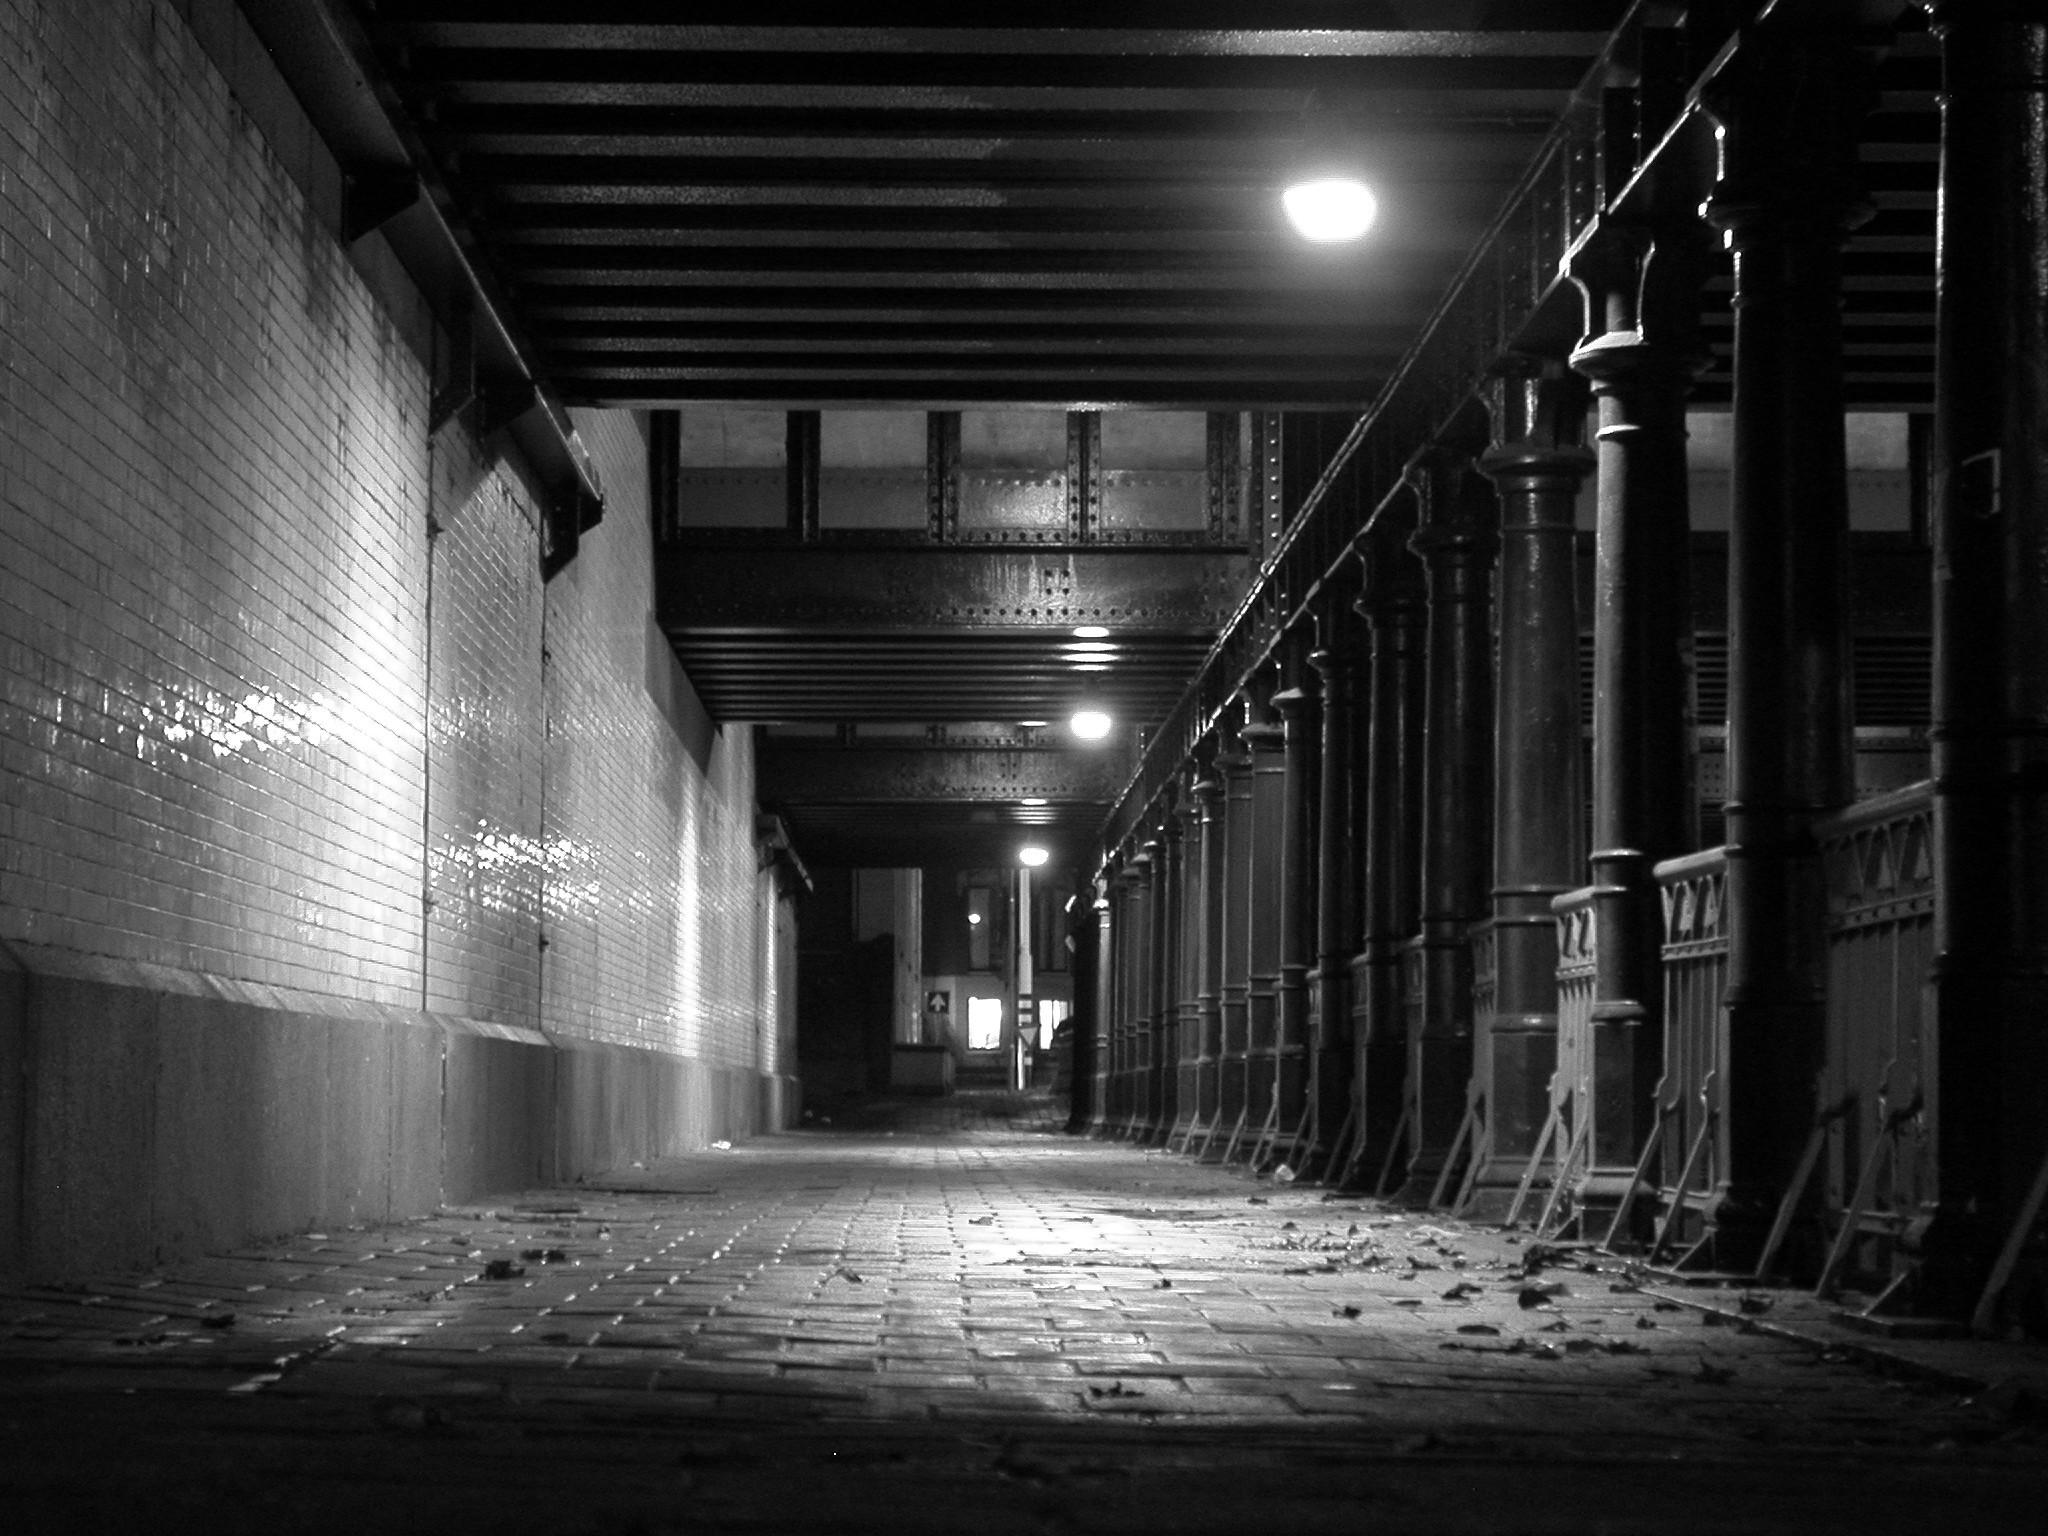 old railway station film noir black and white bridge bricks spooky dark  night nighttime